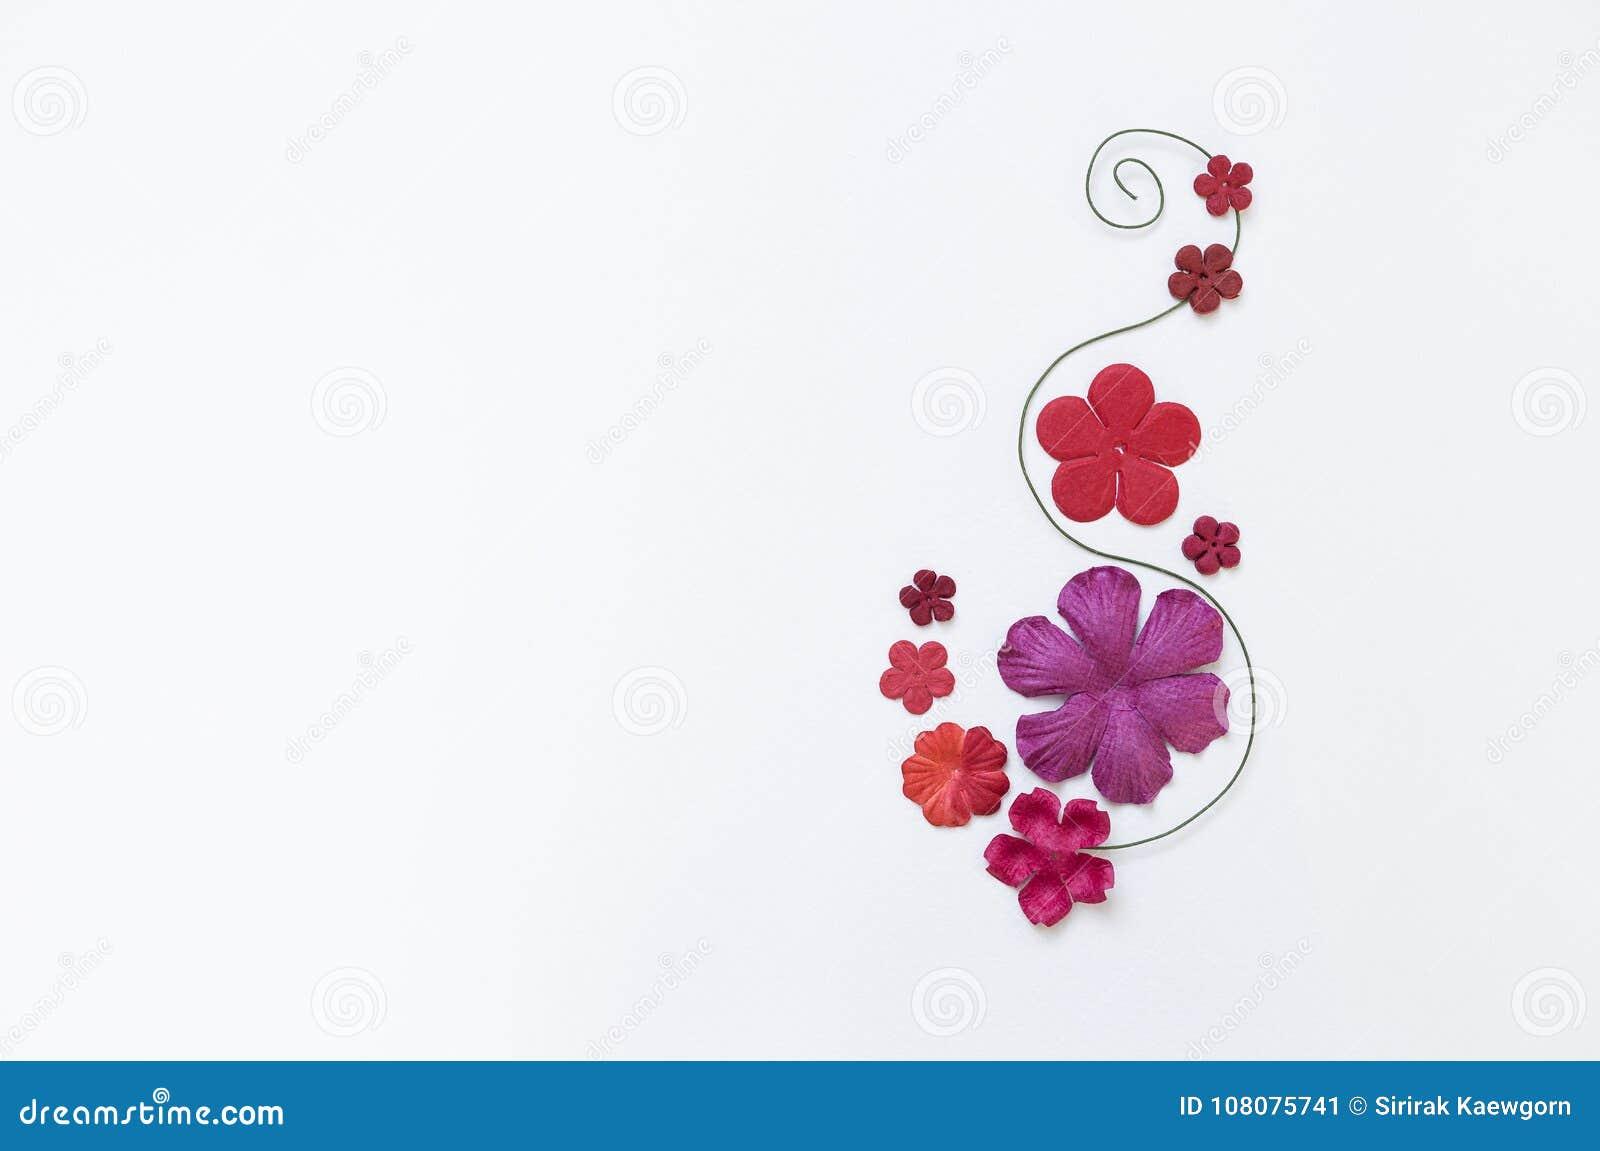 Beautiful Paper Flower Arrangement On White Paper Texture Background